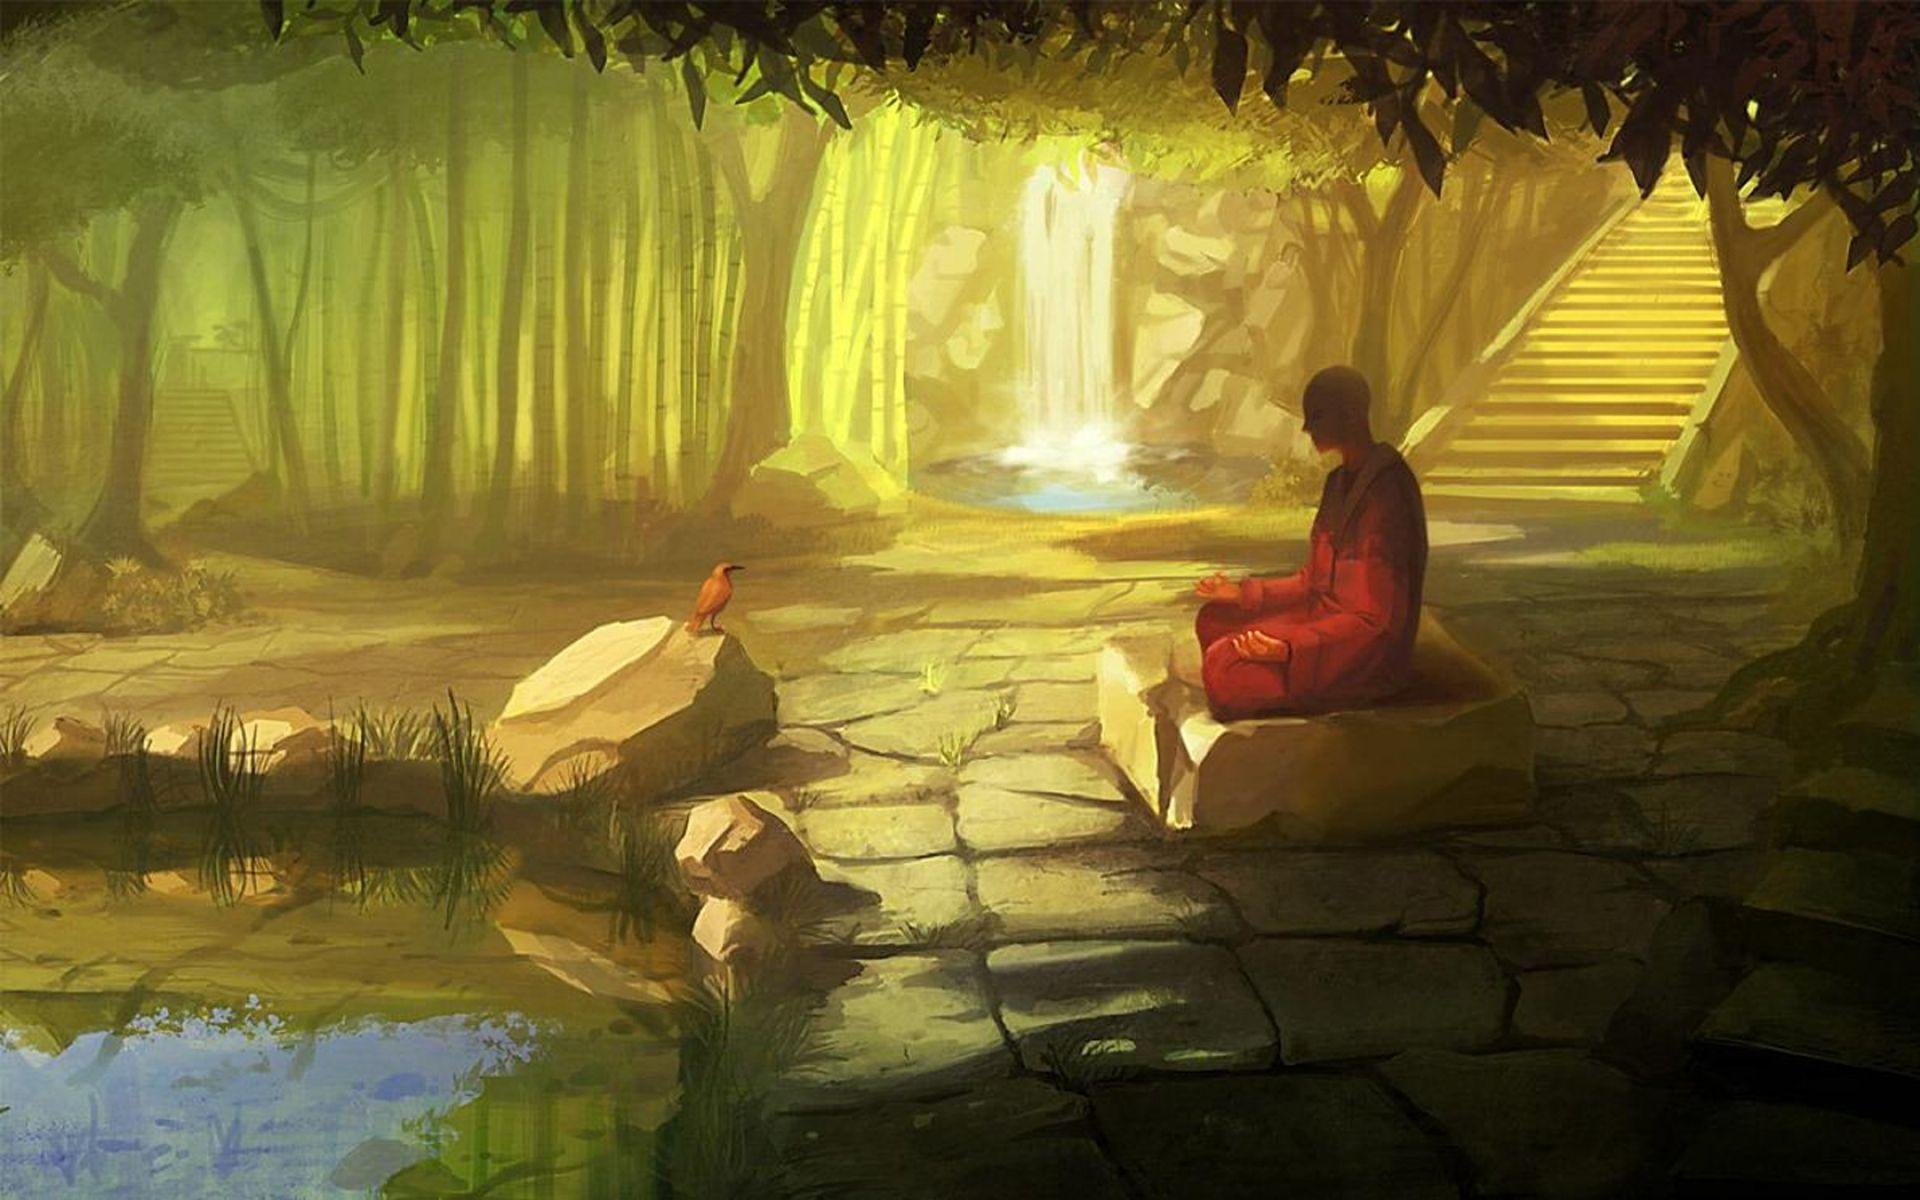 Zen Peaceful Wallpaper Hd